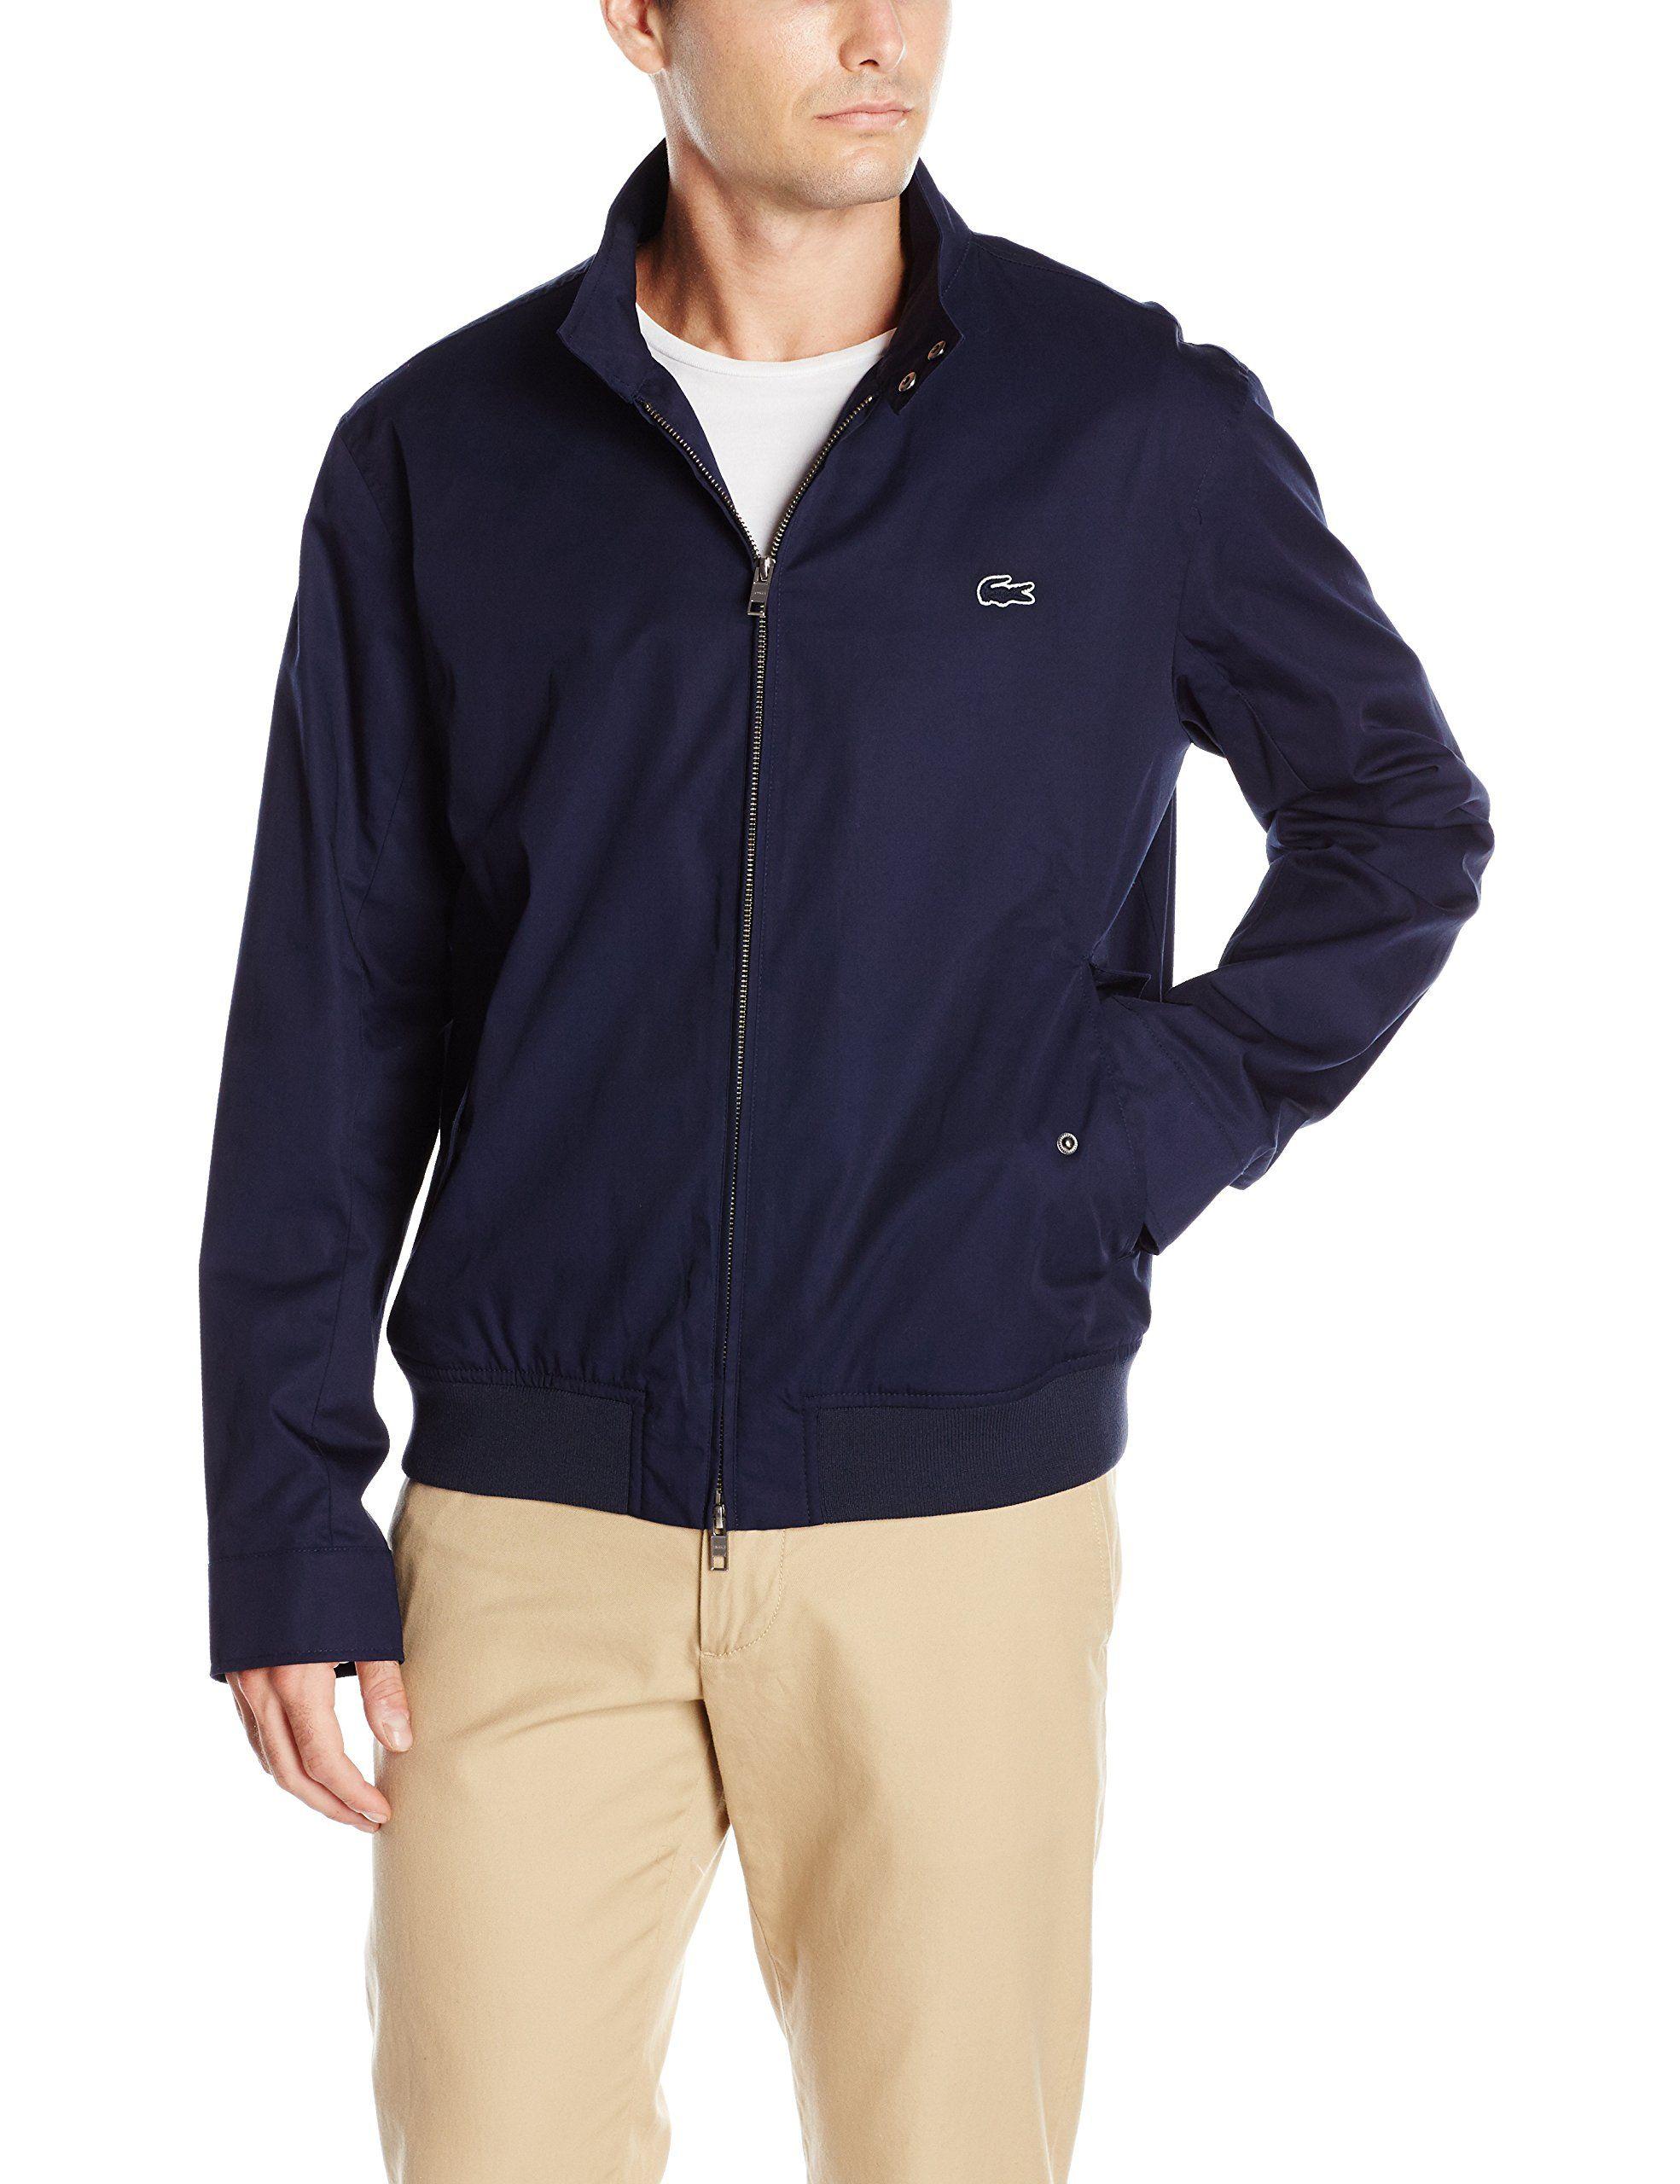 0059dd686 Lacoste Men s Business Casual Harrington Jacket